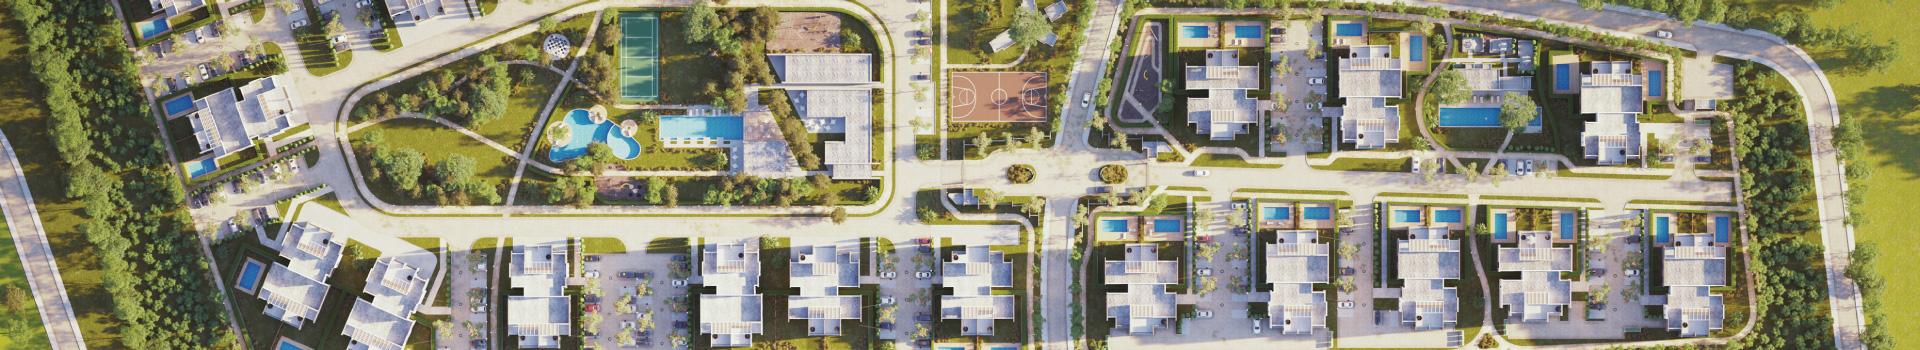 Real Estate: Ώρα μηδέν για δράσεις κατά της κλιματικής αλλαγής